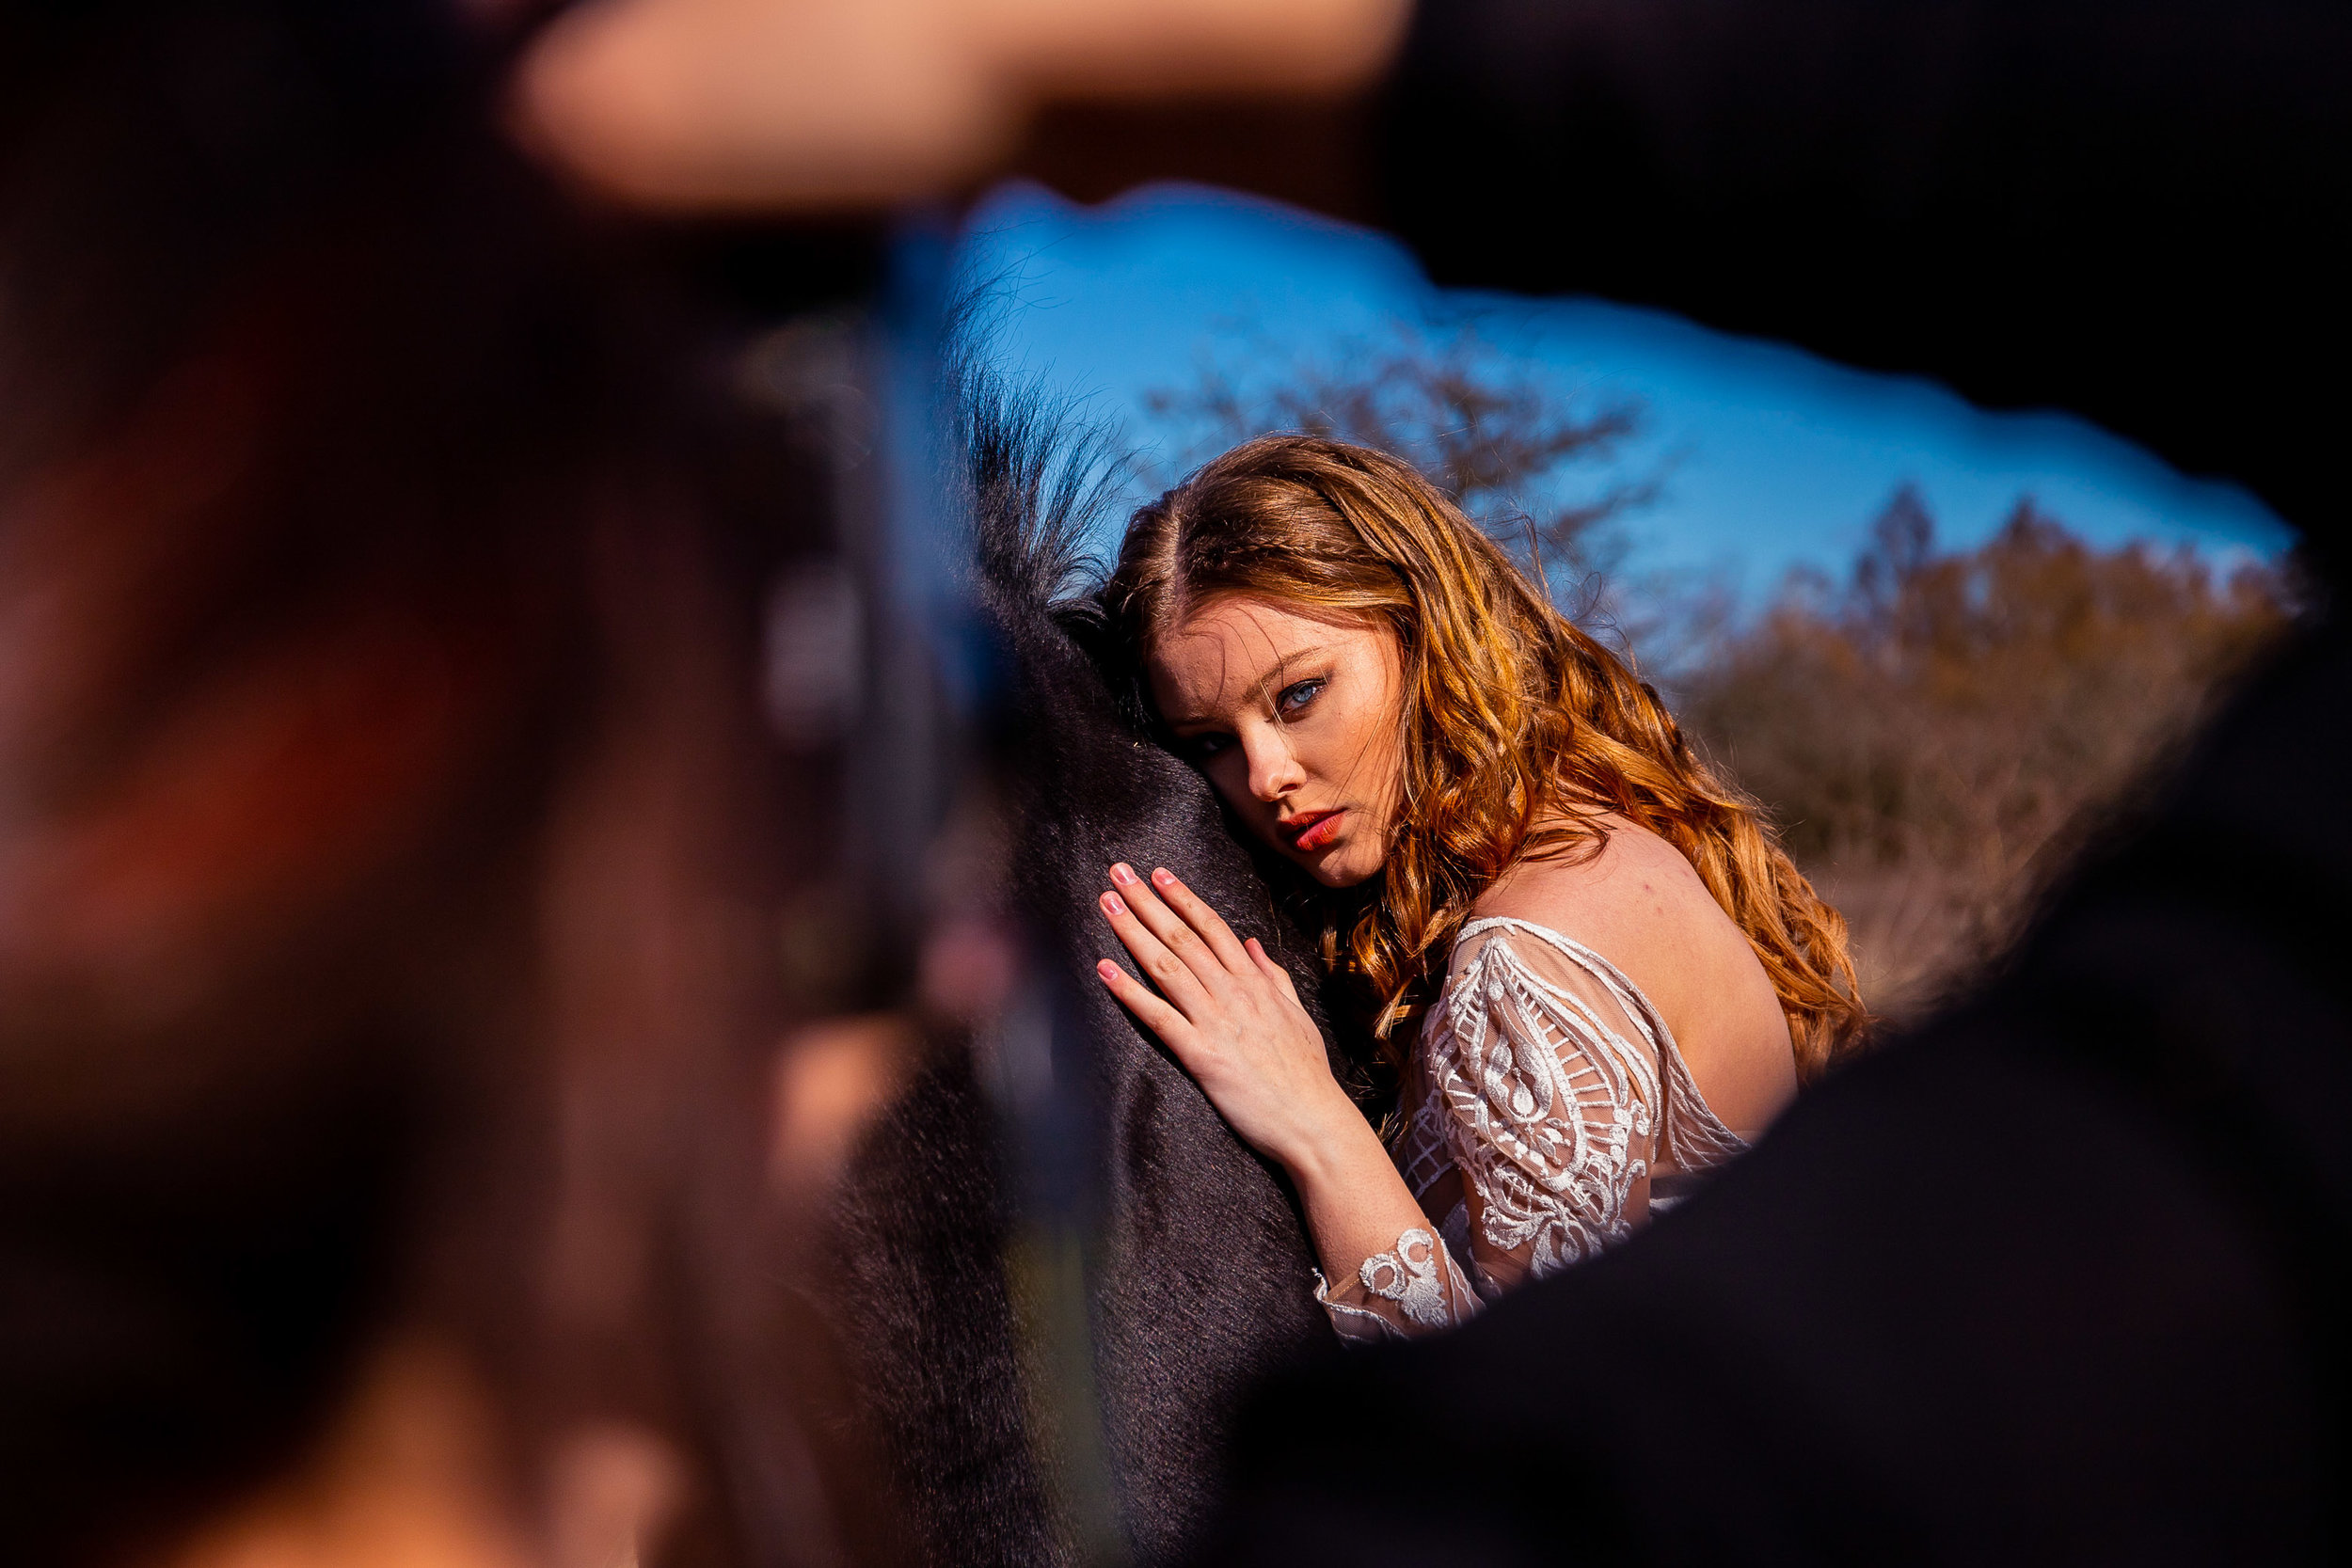 Fashion - High Fashion Photo shoots